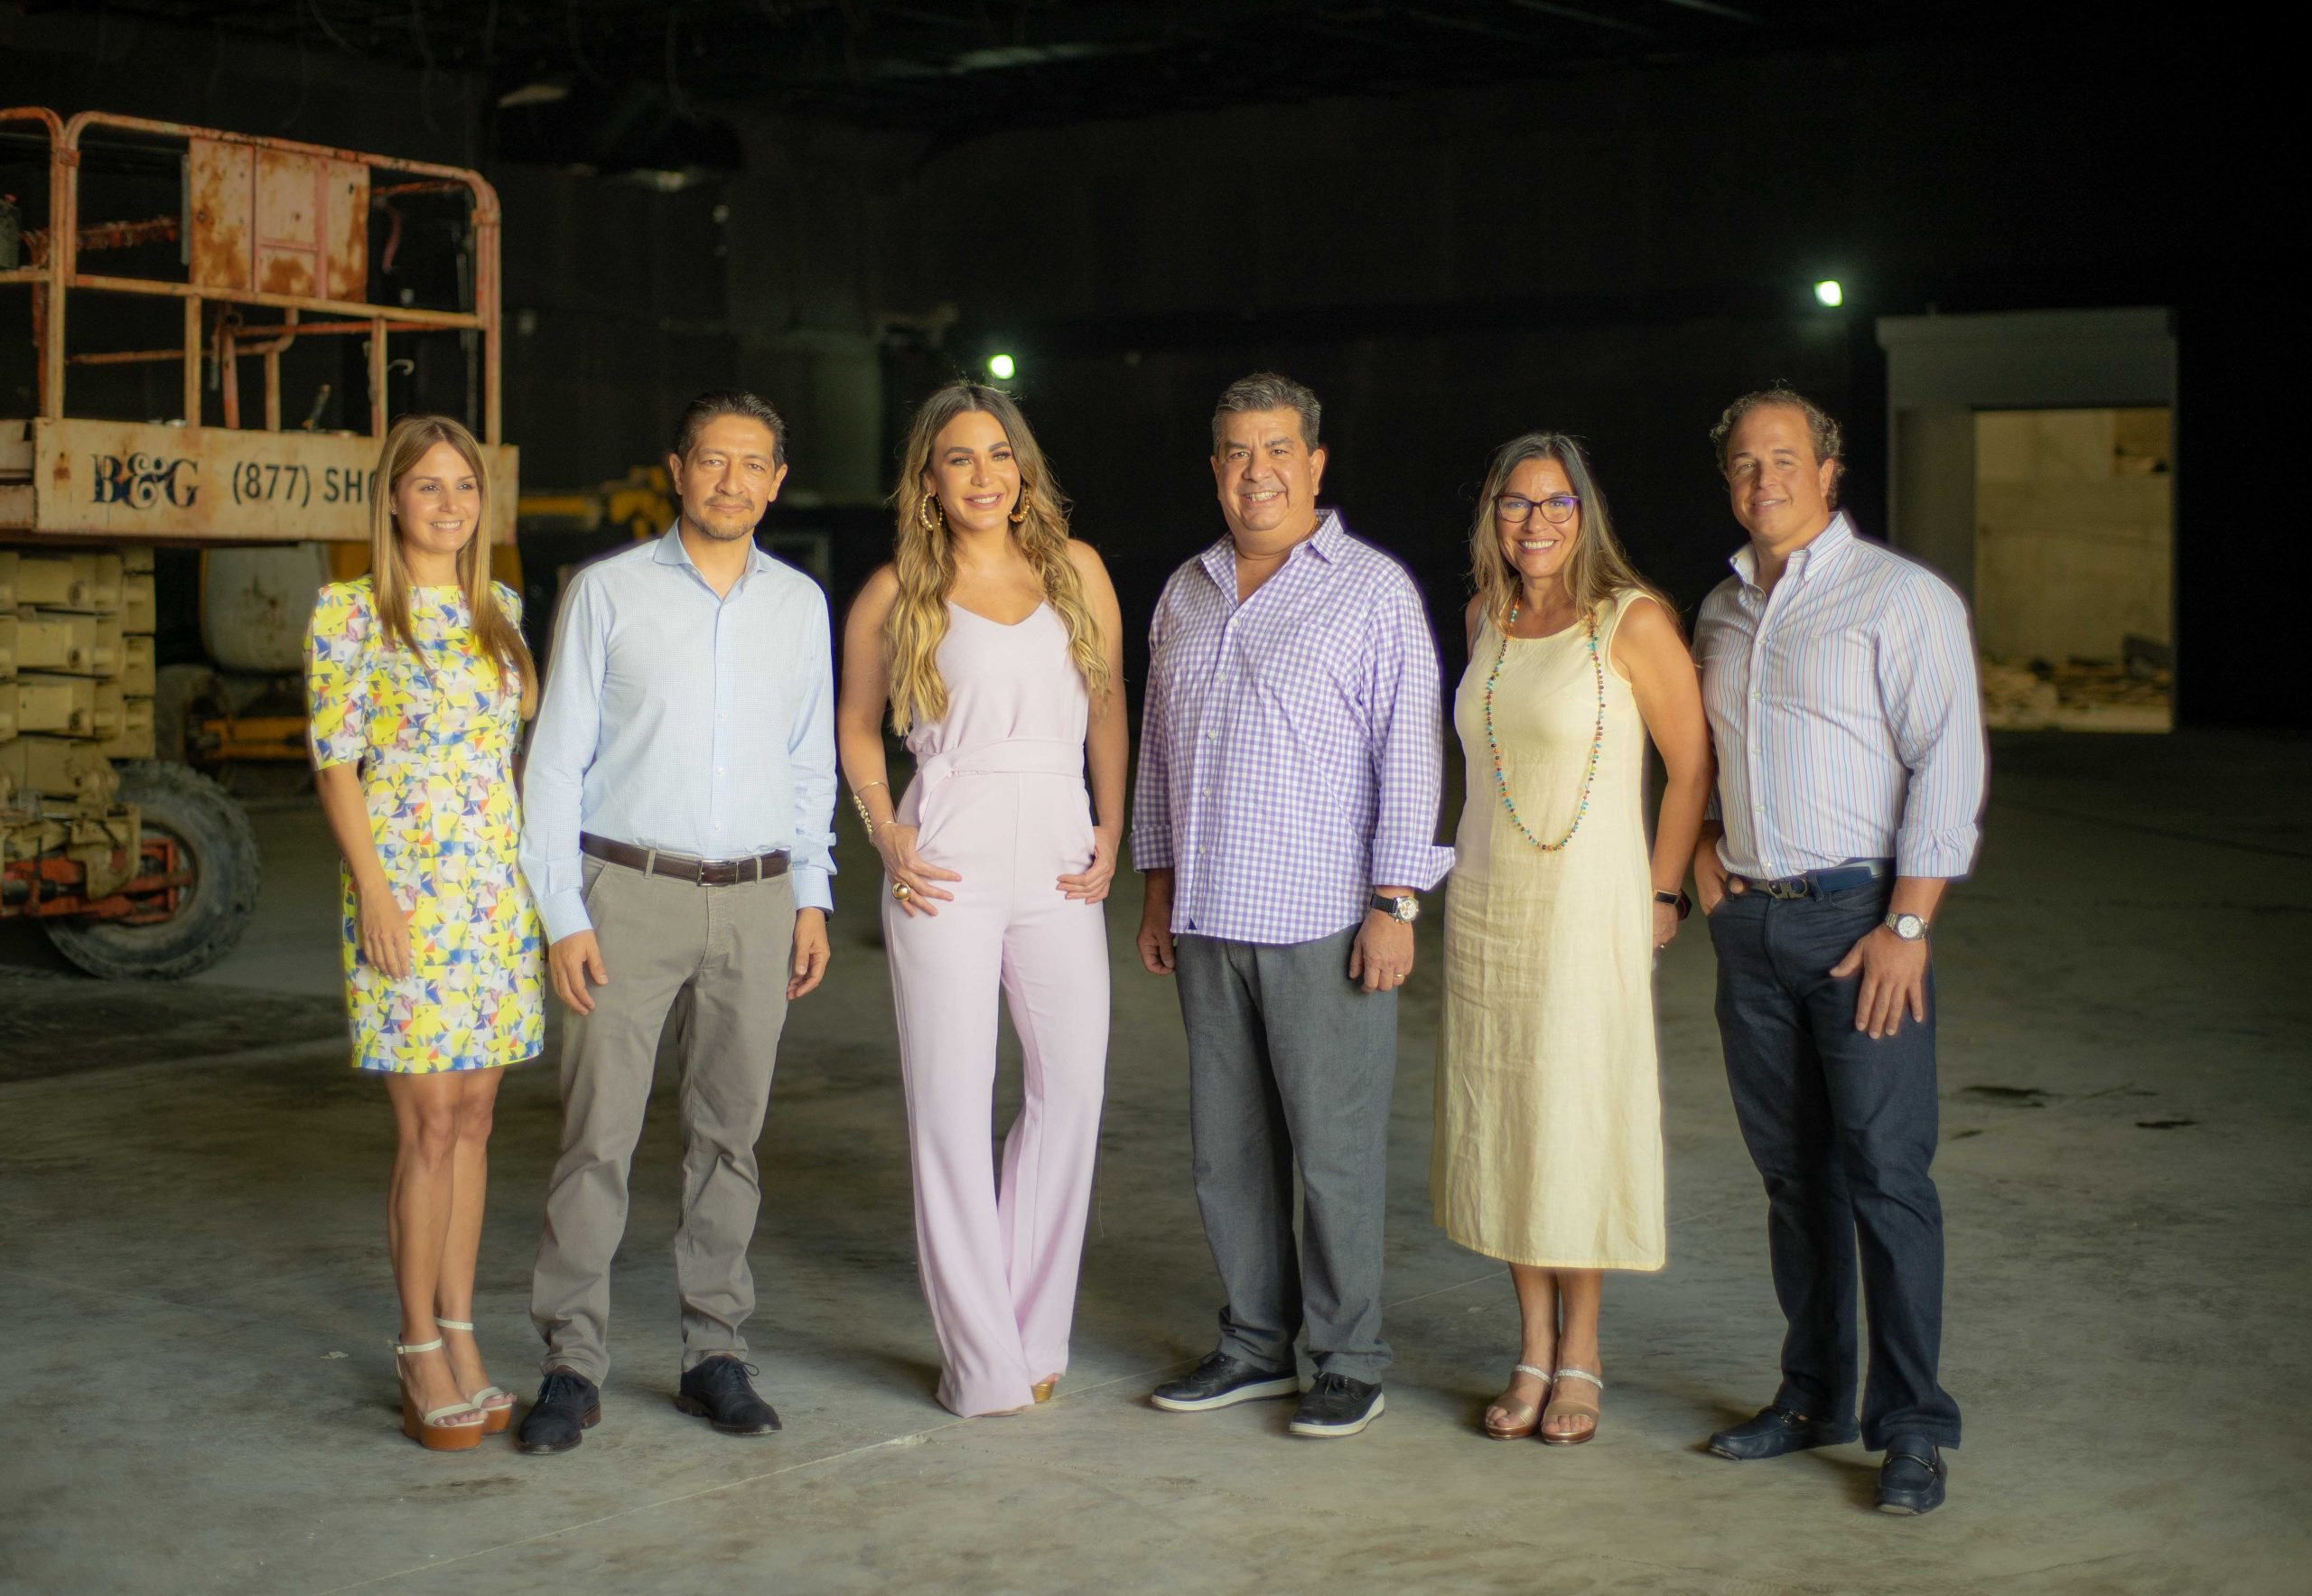 Laura Peña, Oscar Reyna, Luz García, Jesús Hung, Luz Ascanio y Ramón Rodríguez